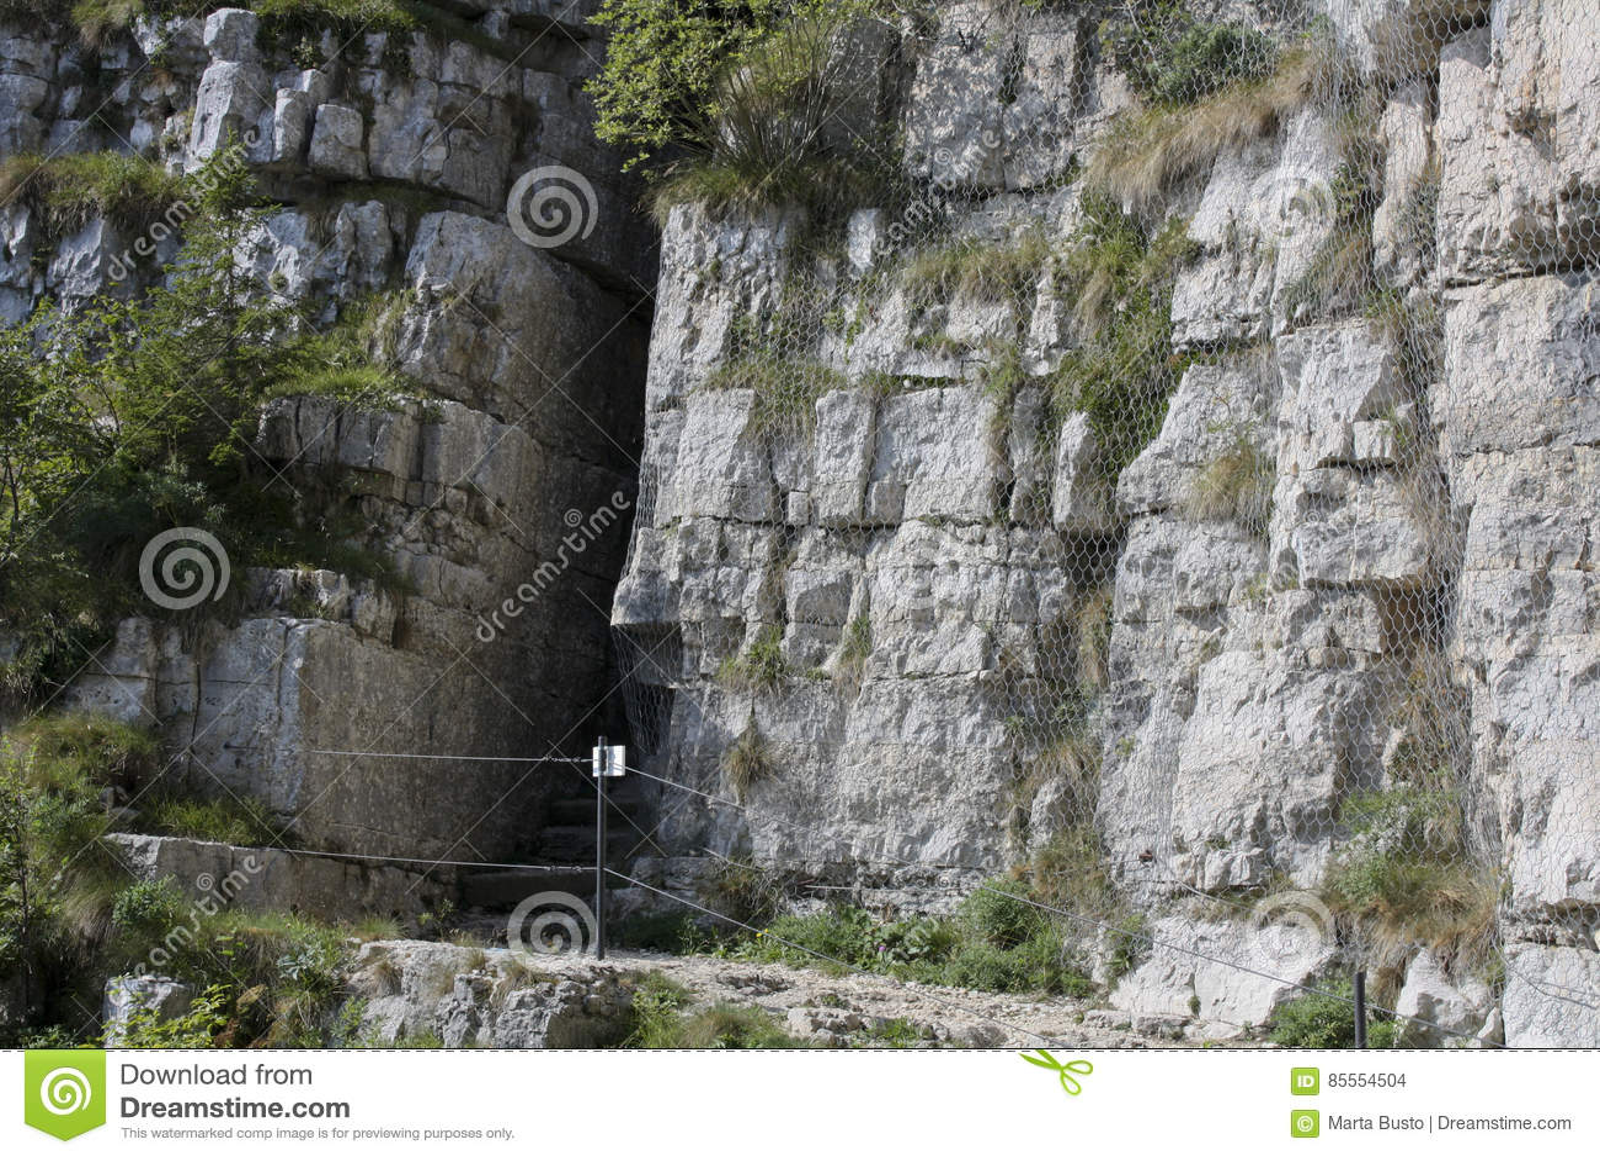 WW Monte Cengio